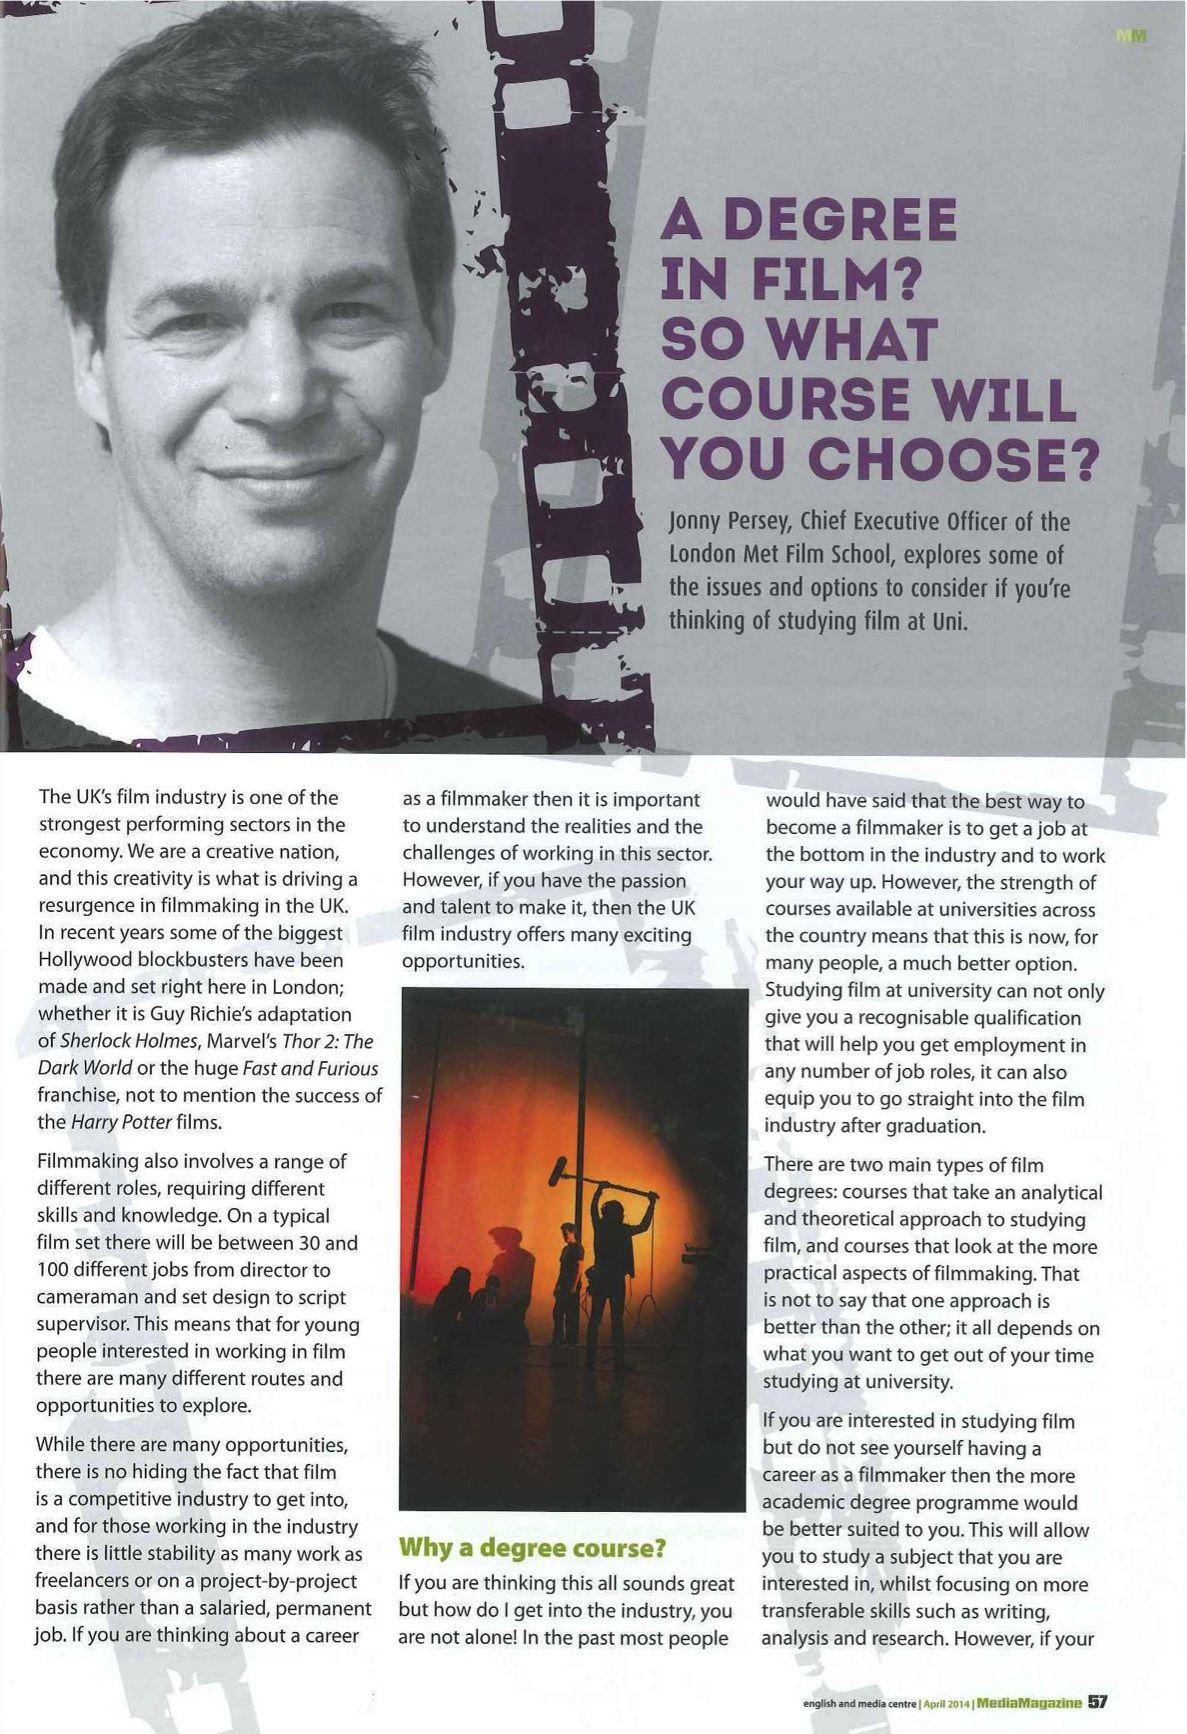 MediaMagazine interviews Met Film's Jonny Persey to talk about choosing your perfect film degree